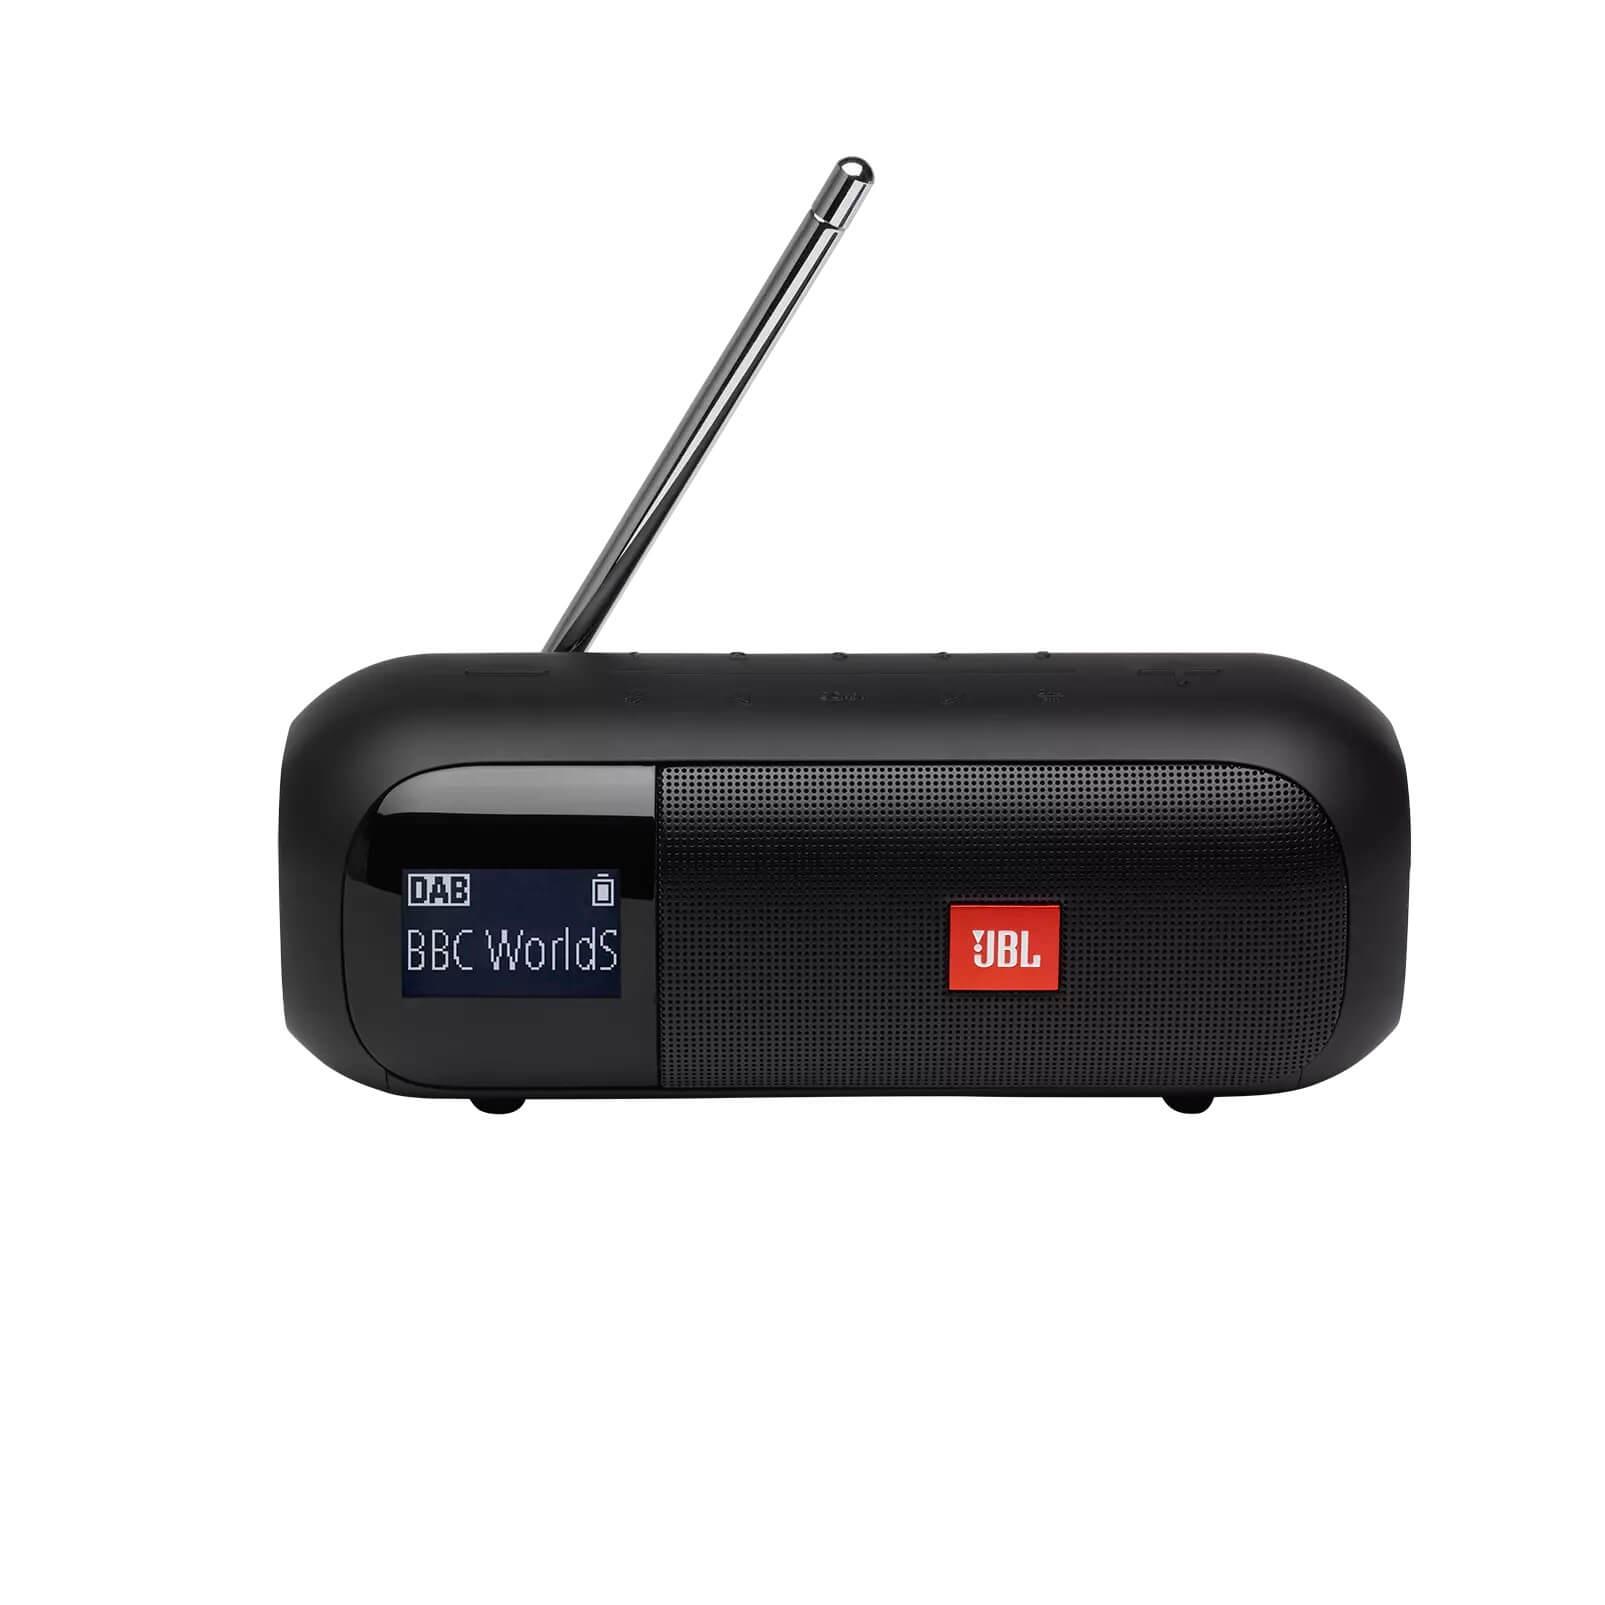 JBL-Tuner-2-by-Harman-Portable-Bluetooth-Speaker-with-FM-Radio